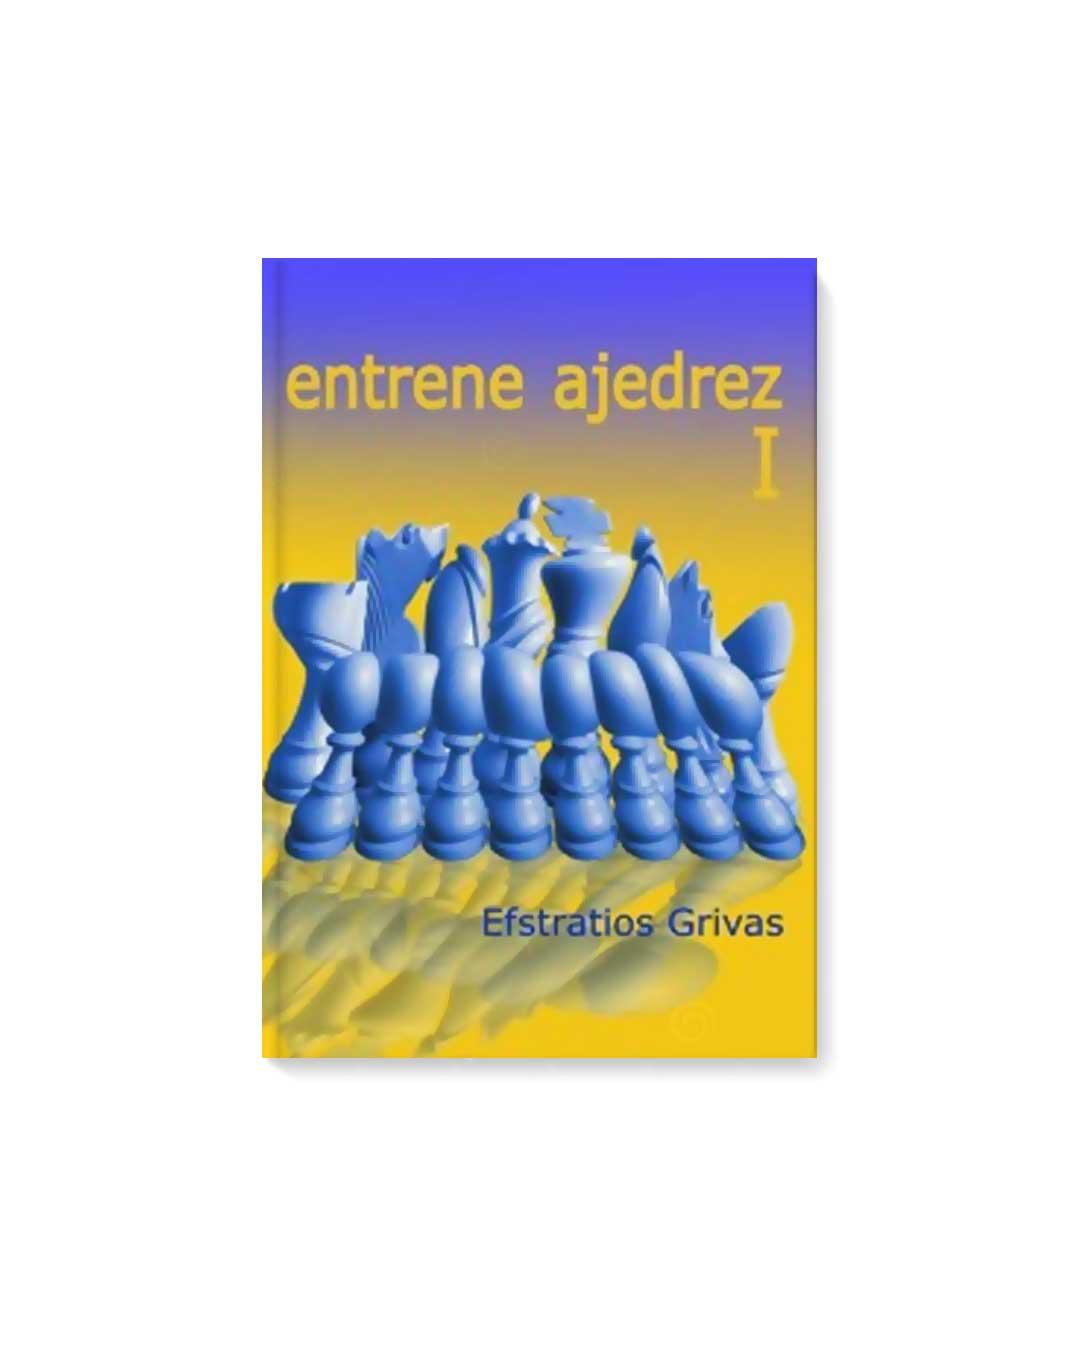 Entrene ajedrez vol 1 - Grivas